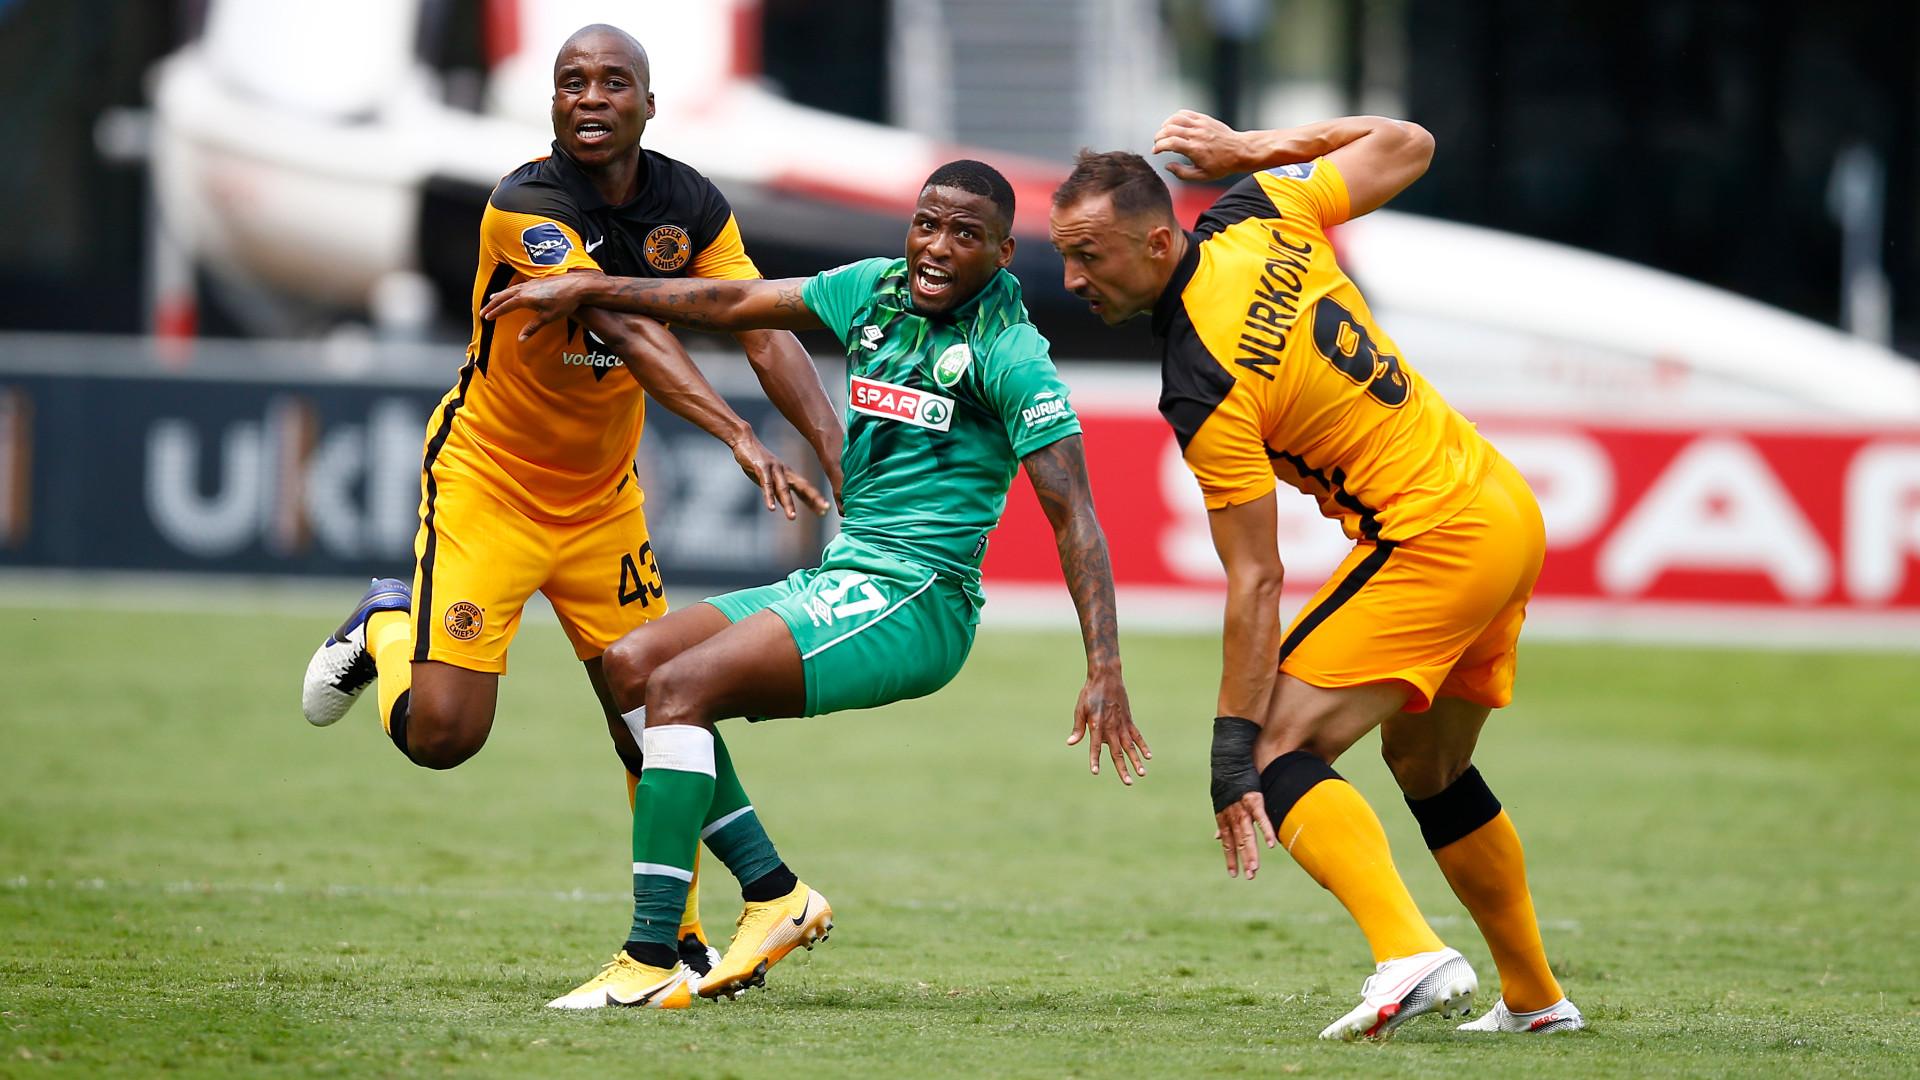 Hunt lauds Nurkovic's impact in Kaizer Chiefs win over AmaZulu